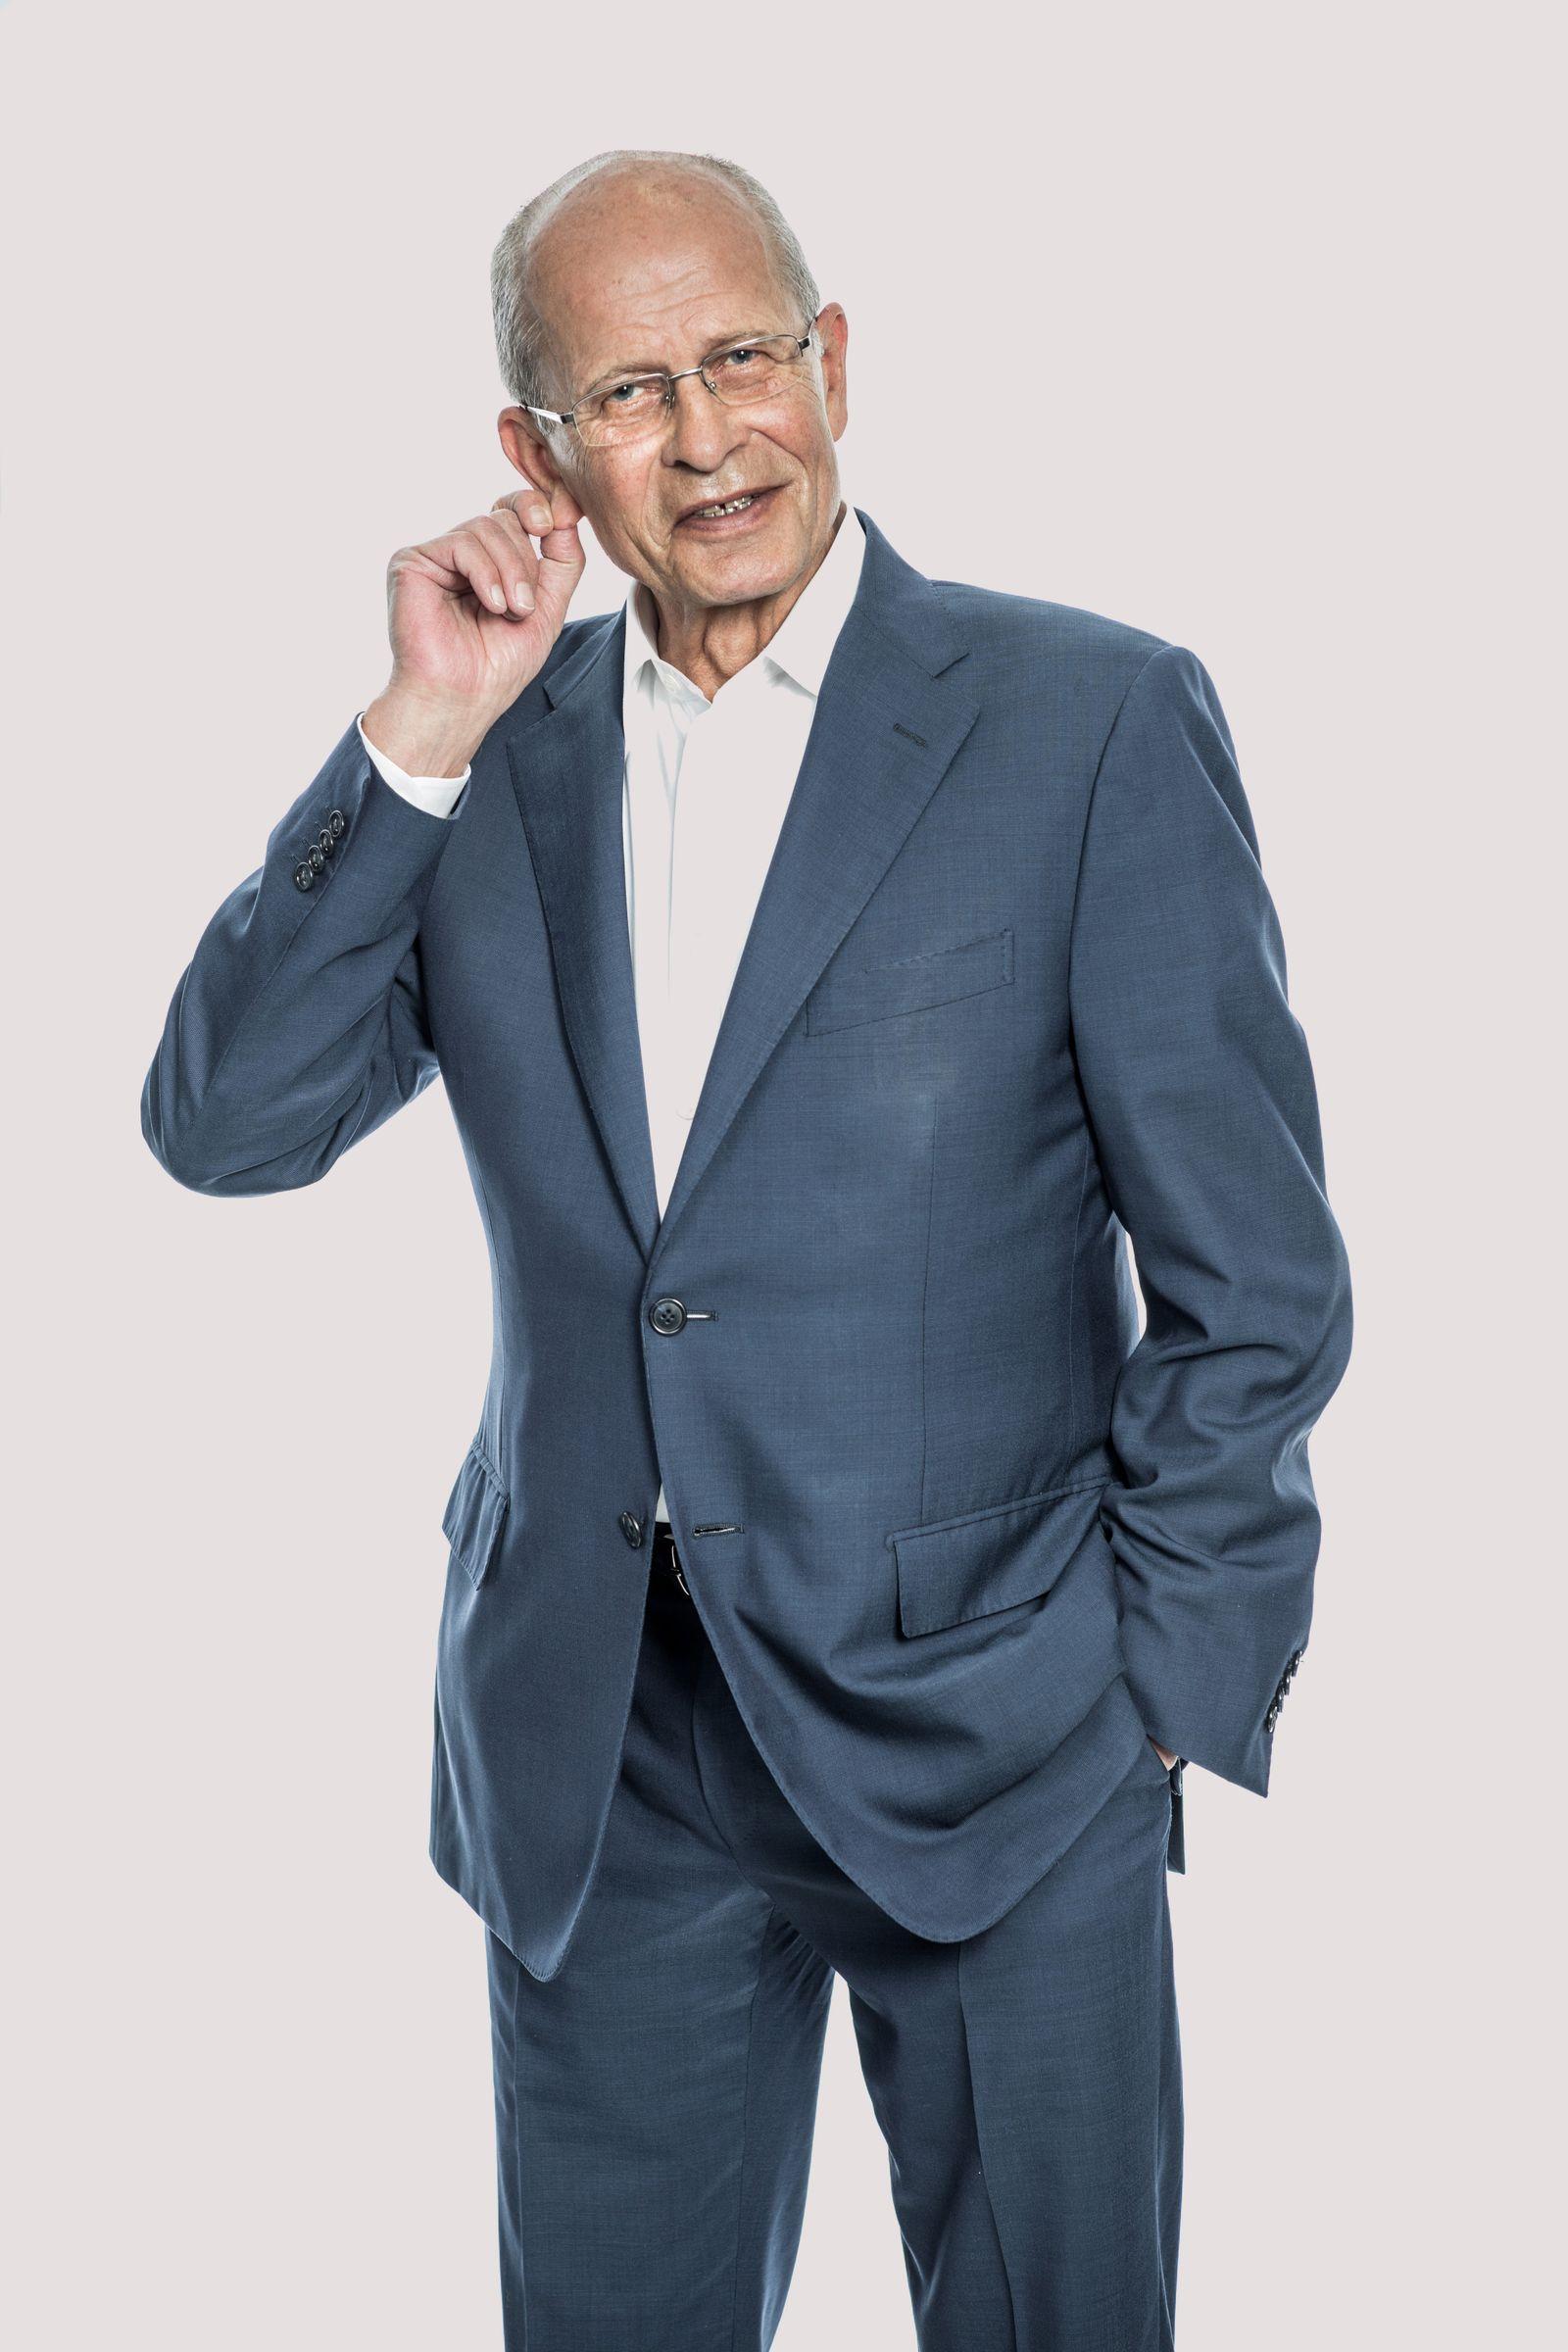 Berthold Huber ehemaliger Vorsitzender der IG Metall